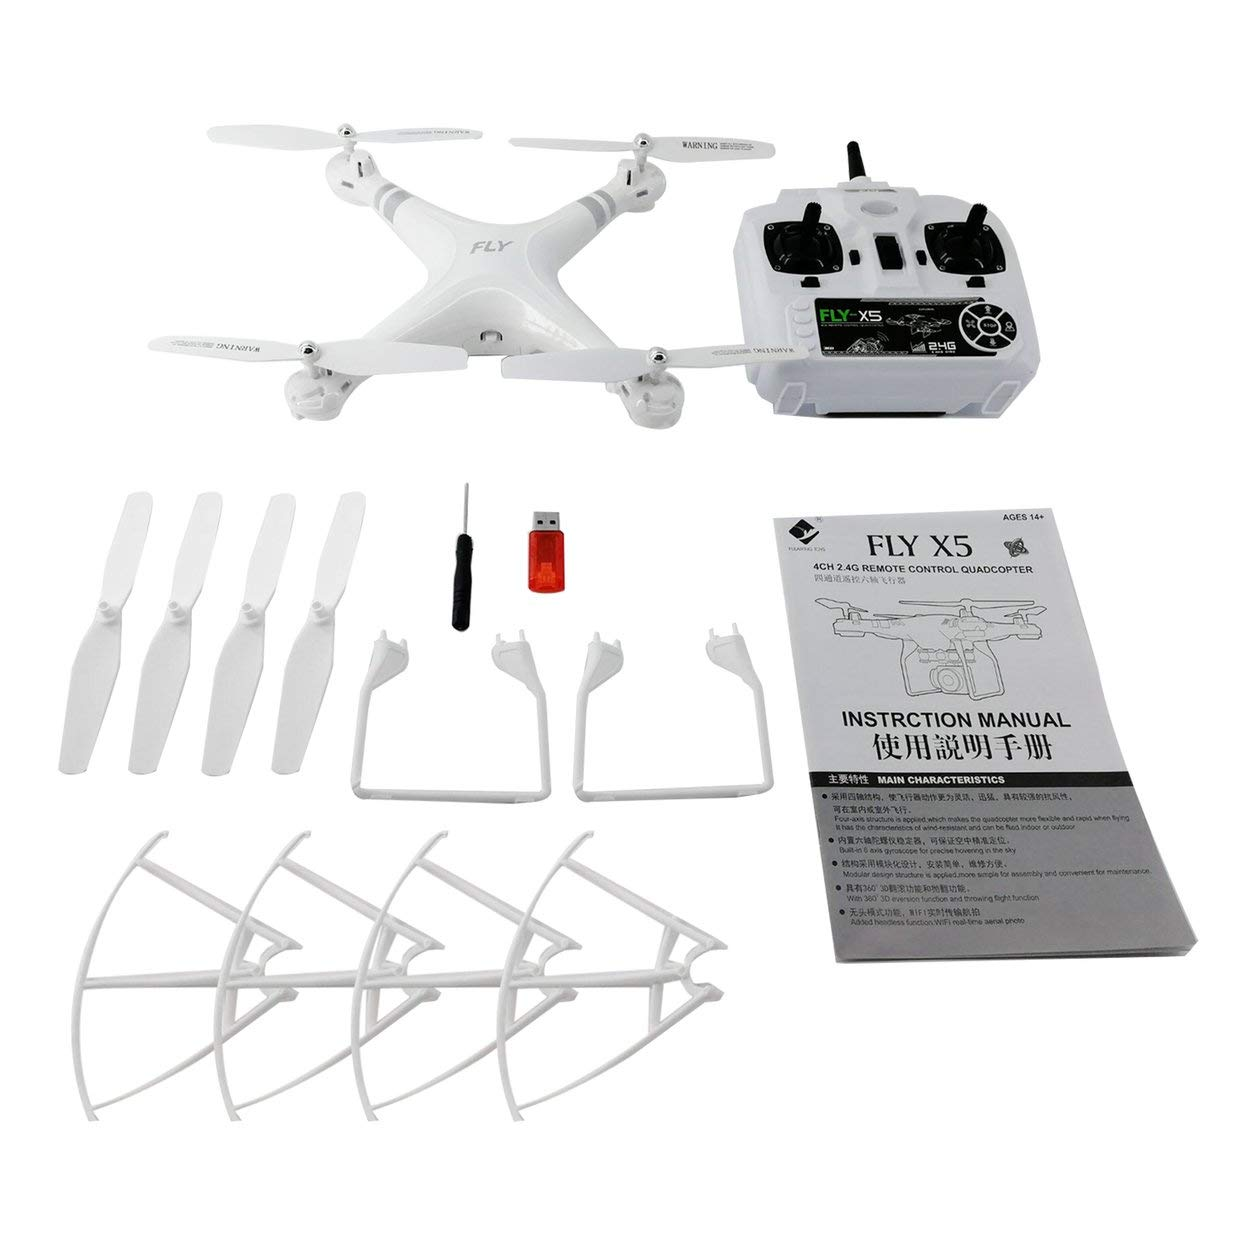 X52 Weitwinkelobjektiv 0.3MP HD Kamera Drohne WiFi FPV Live Quadcopter Smart Höhe Halten Hover RC Hubschrauber 2,4 GHz Drohne